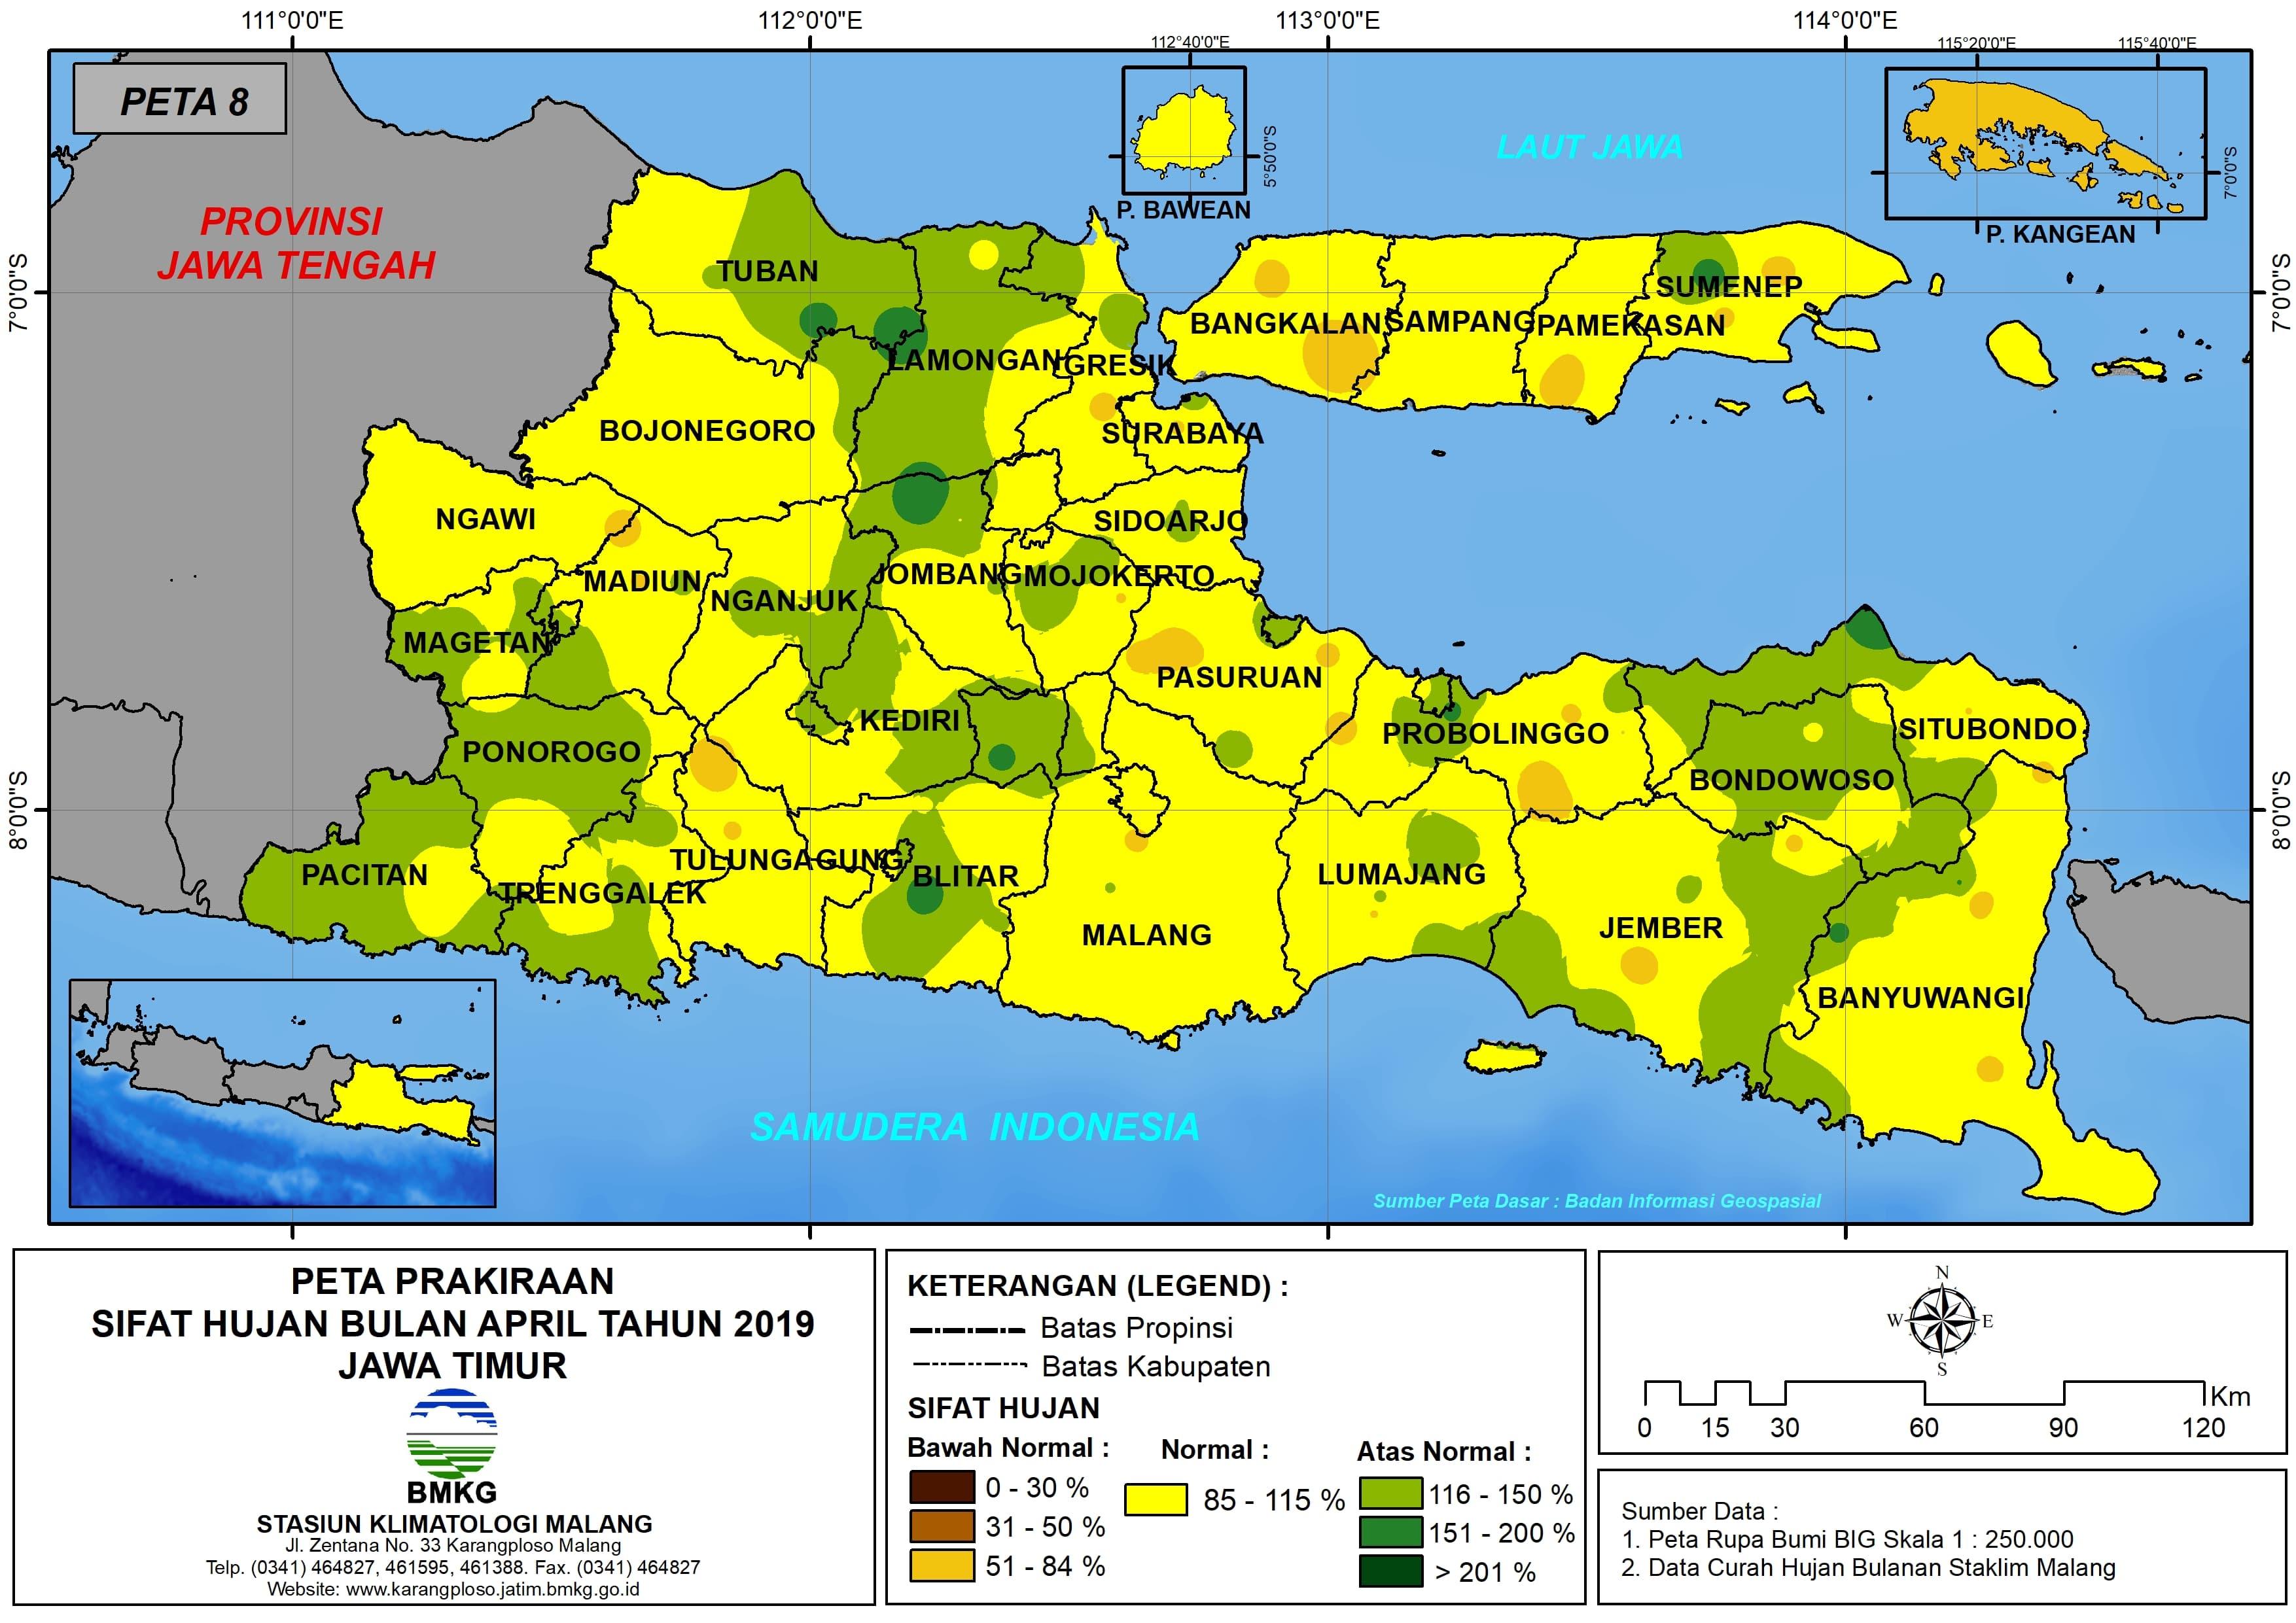 Prakiraan Sifat Hujan Bulan April Tahun 2018 di Provinsi Jawa Timur Update dari Analisis Bulan Desember 2018